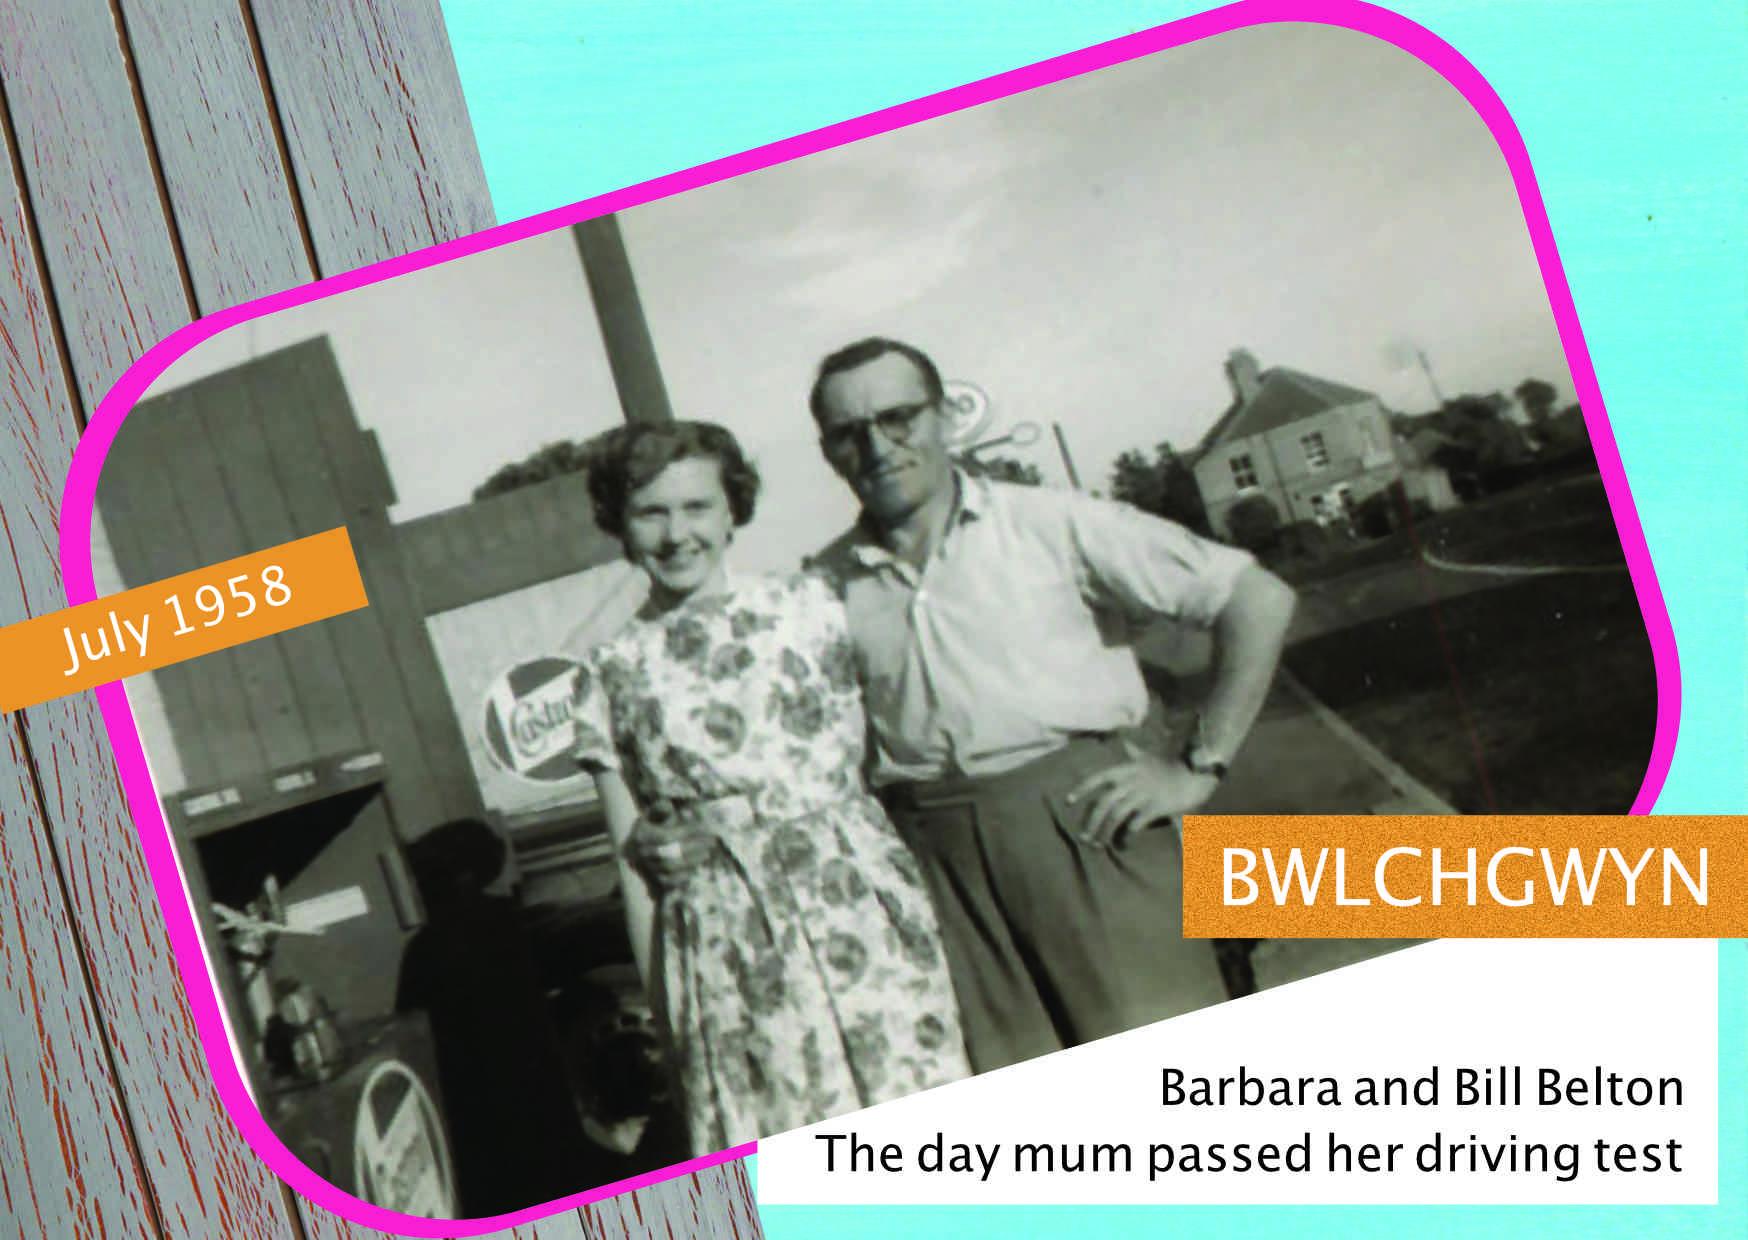 Bill and Barbara Belton, July 1958.